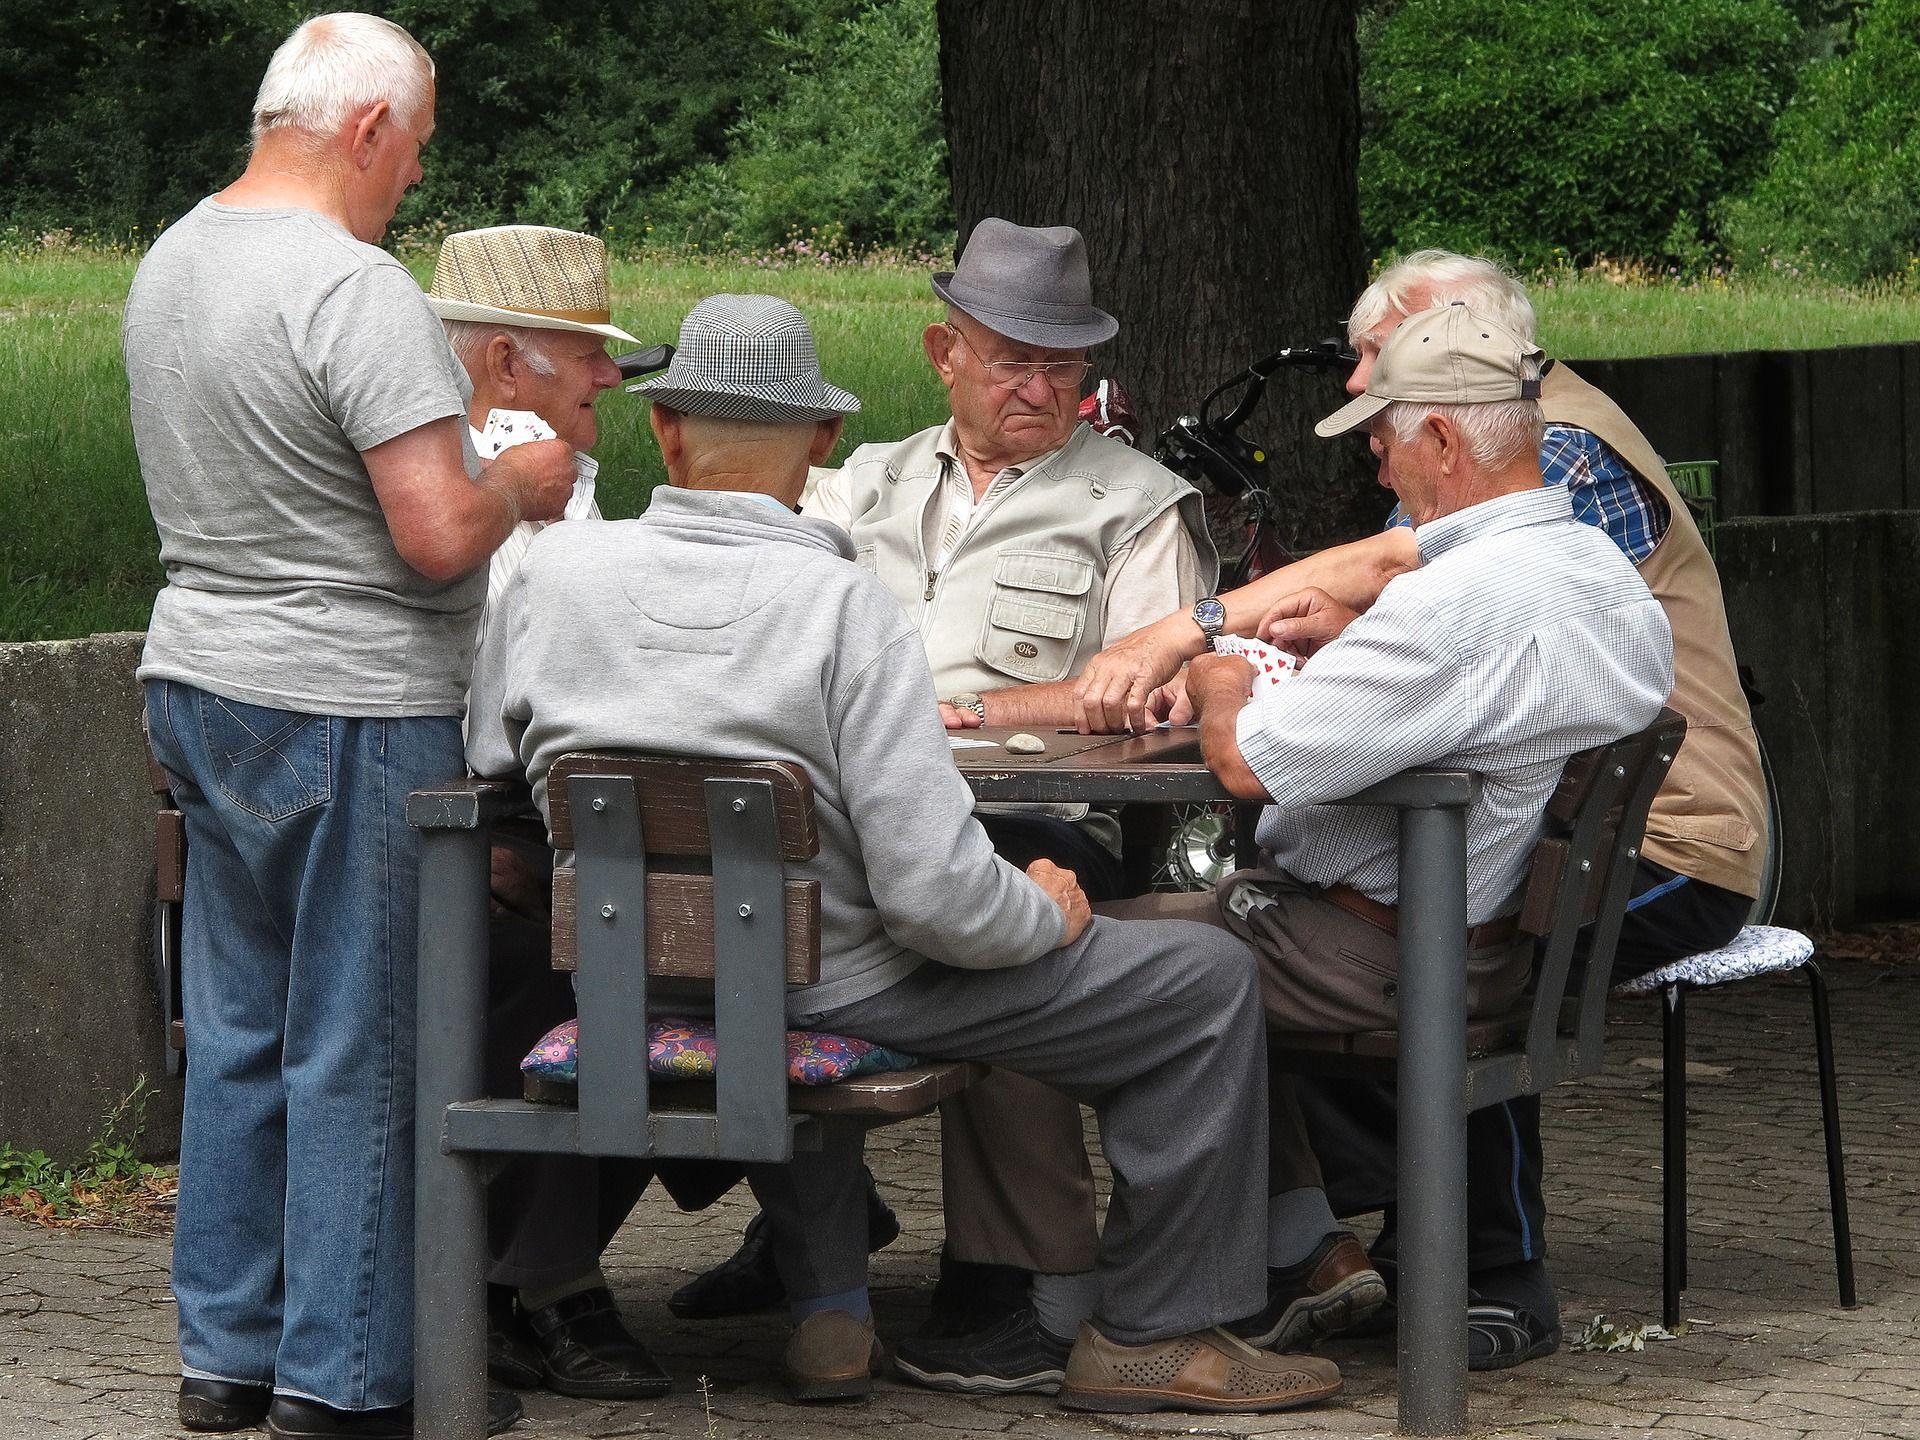 Rentner spielen Karten